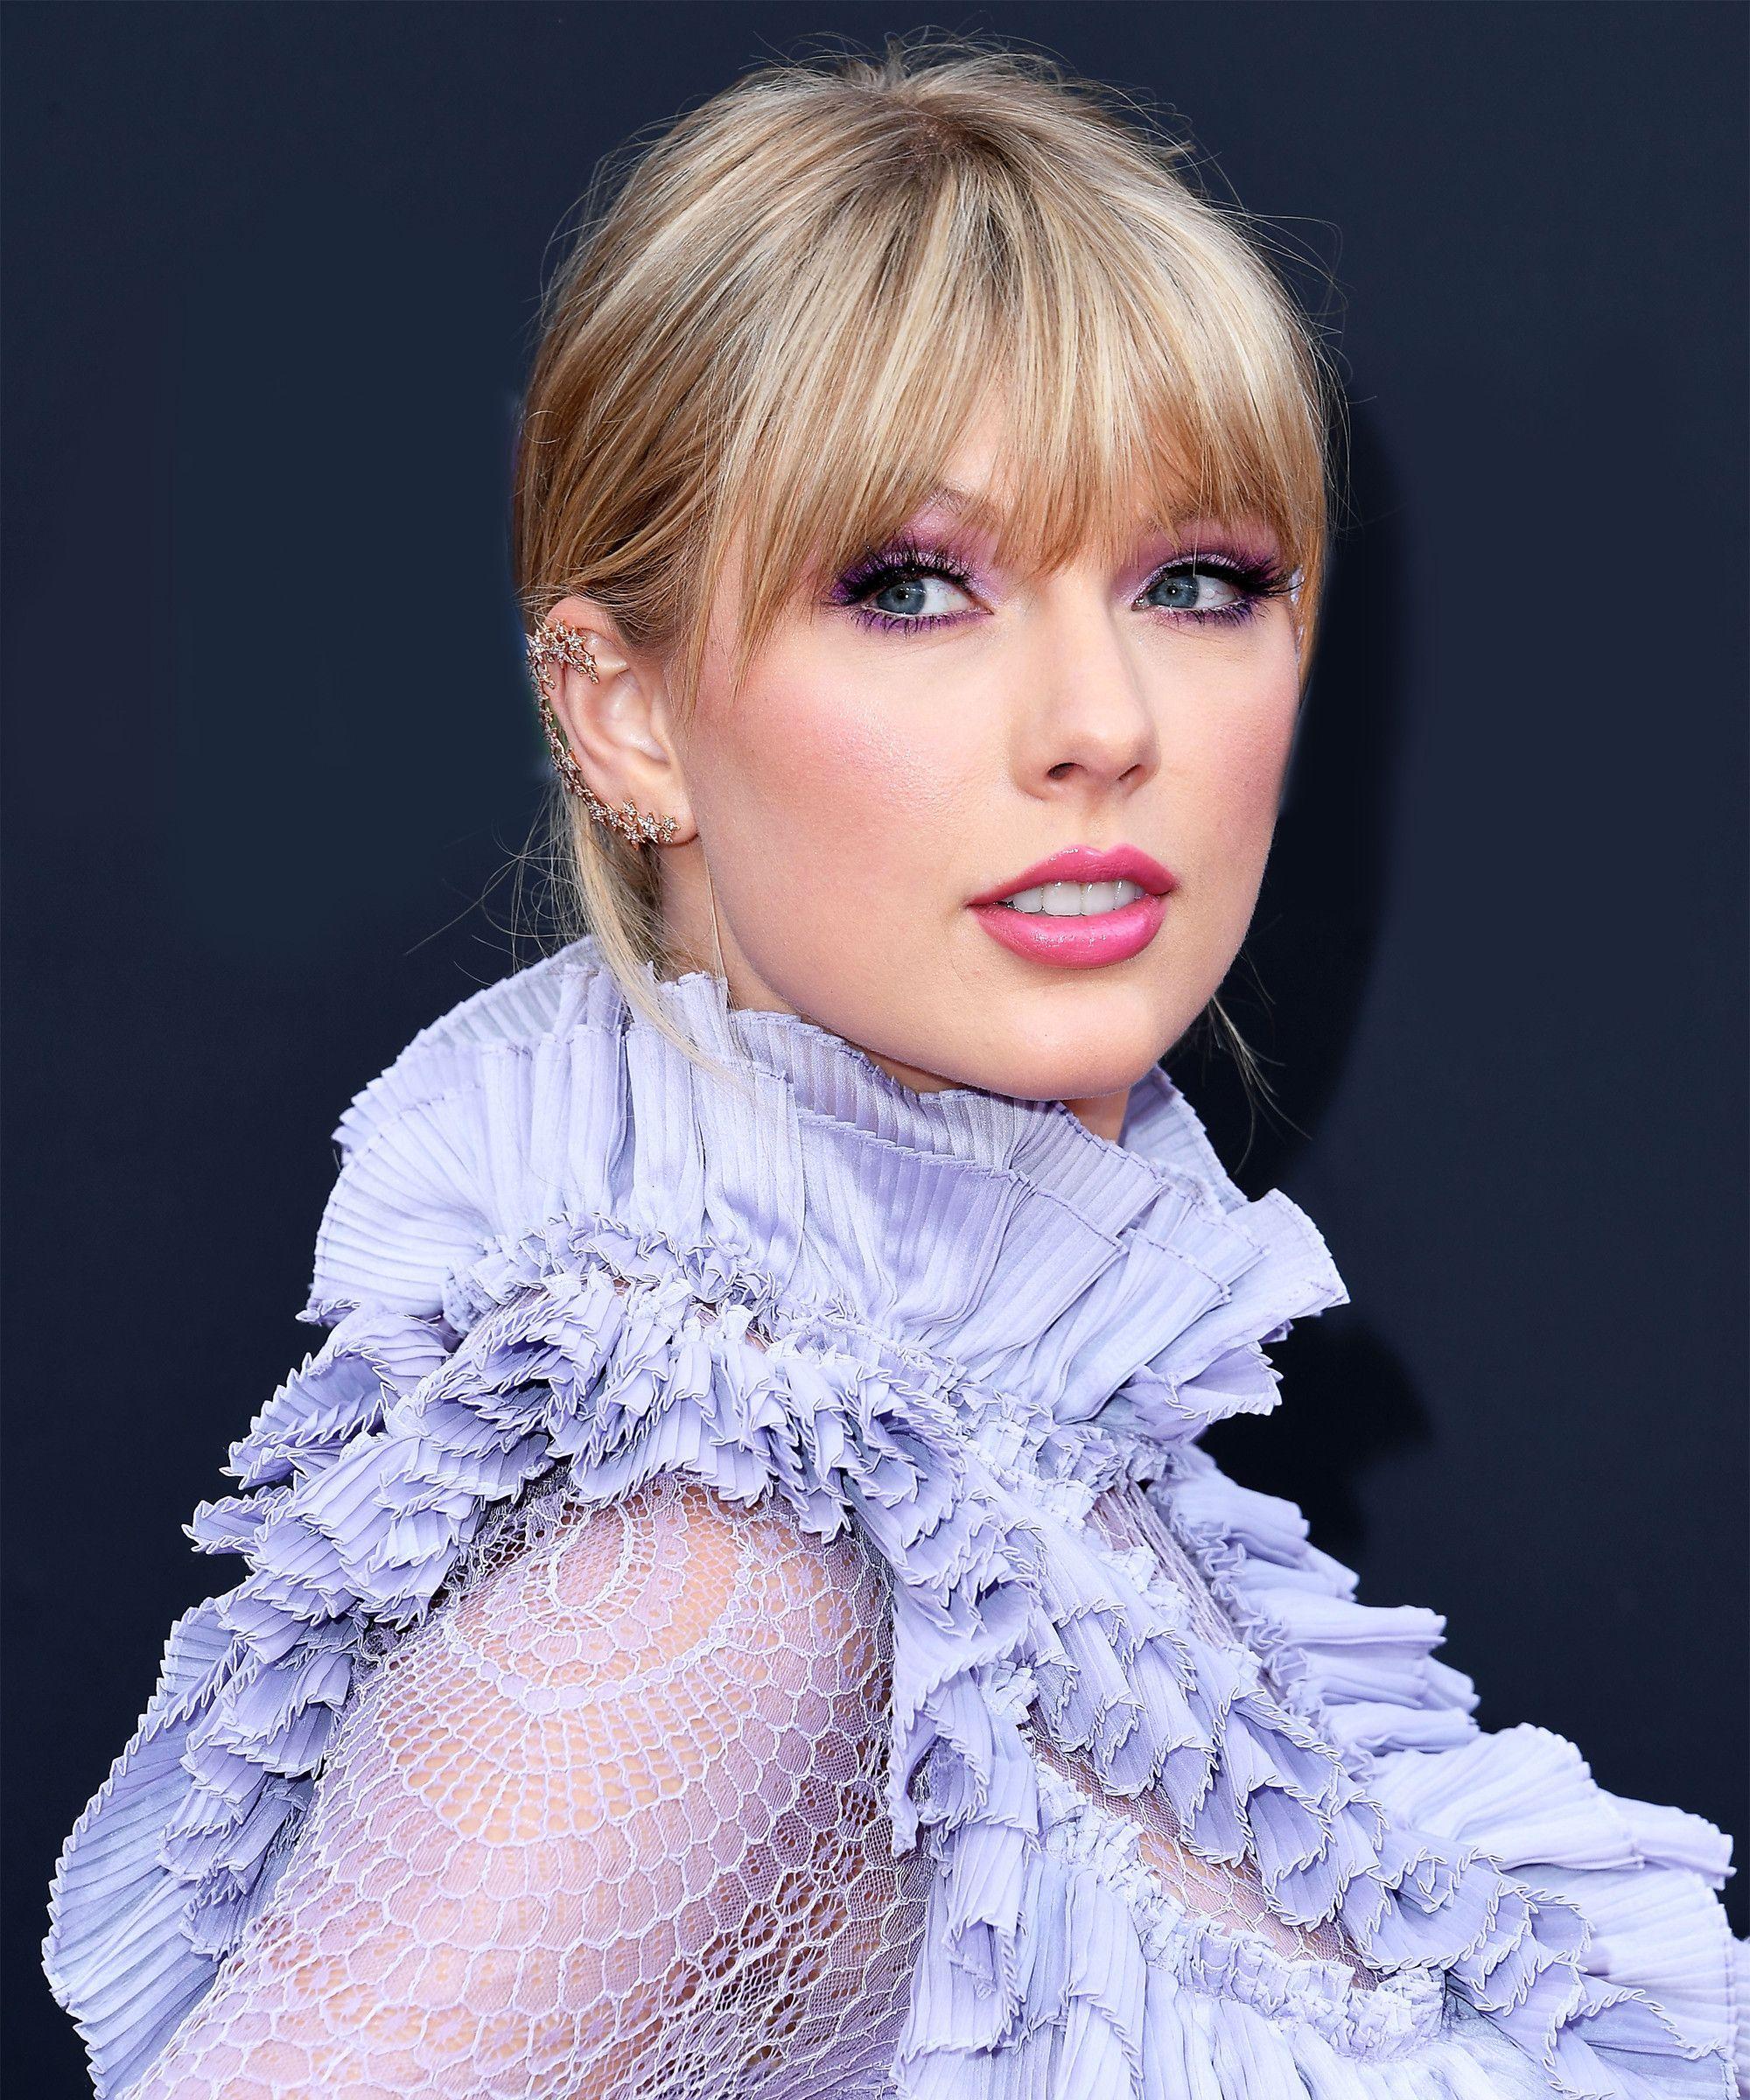 Taylor Swift Loose Ponytail Taylor Swift Hair Taylor Swift Bangs Taylor Swift Style